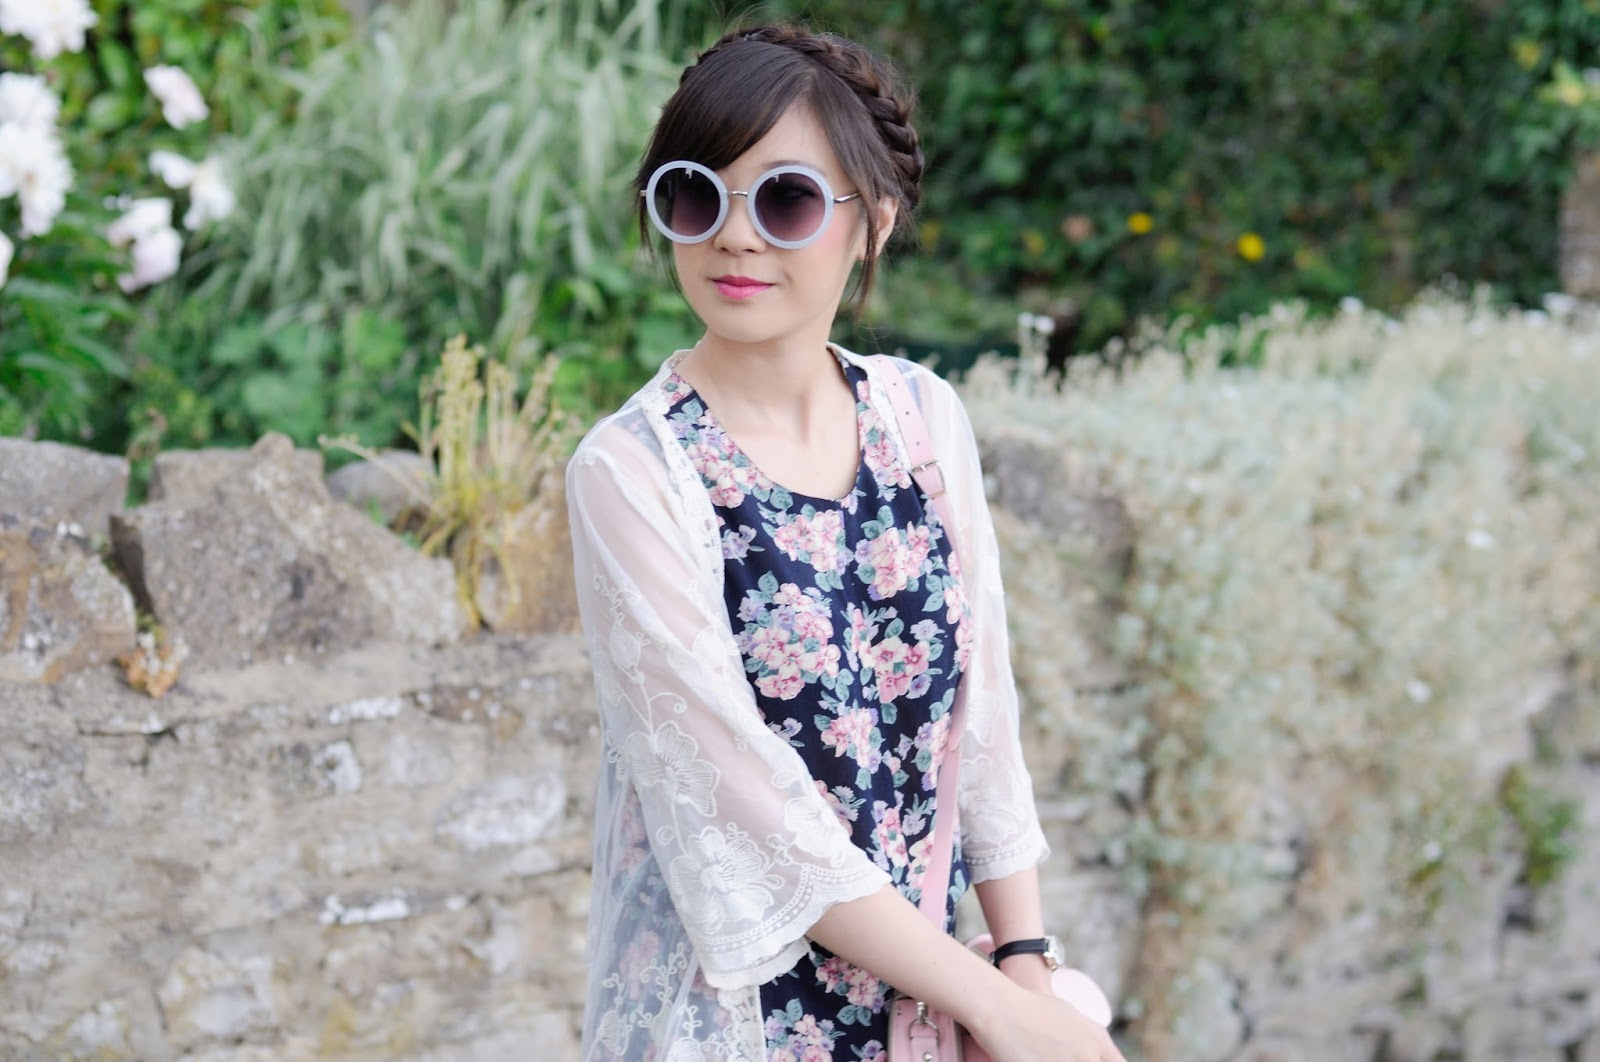 Floral Playsuit ASOS, UK Style blogger, heidi braids, milkmaid braid hairstyle